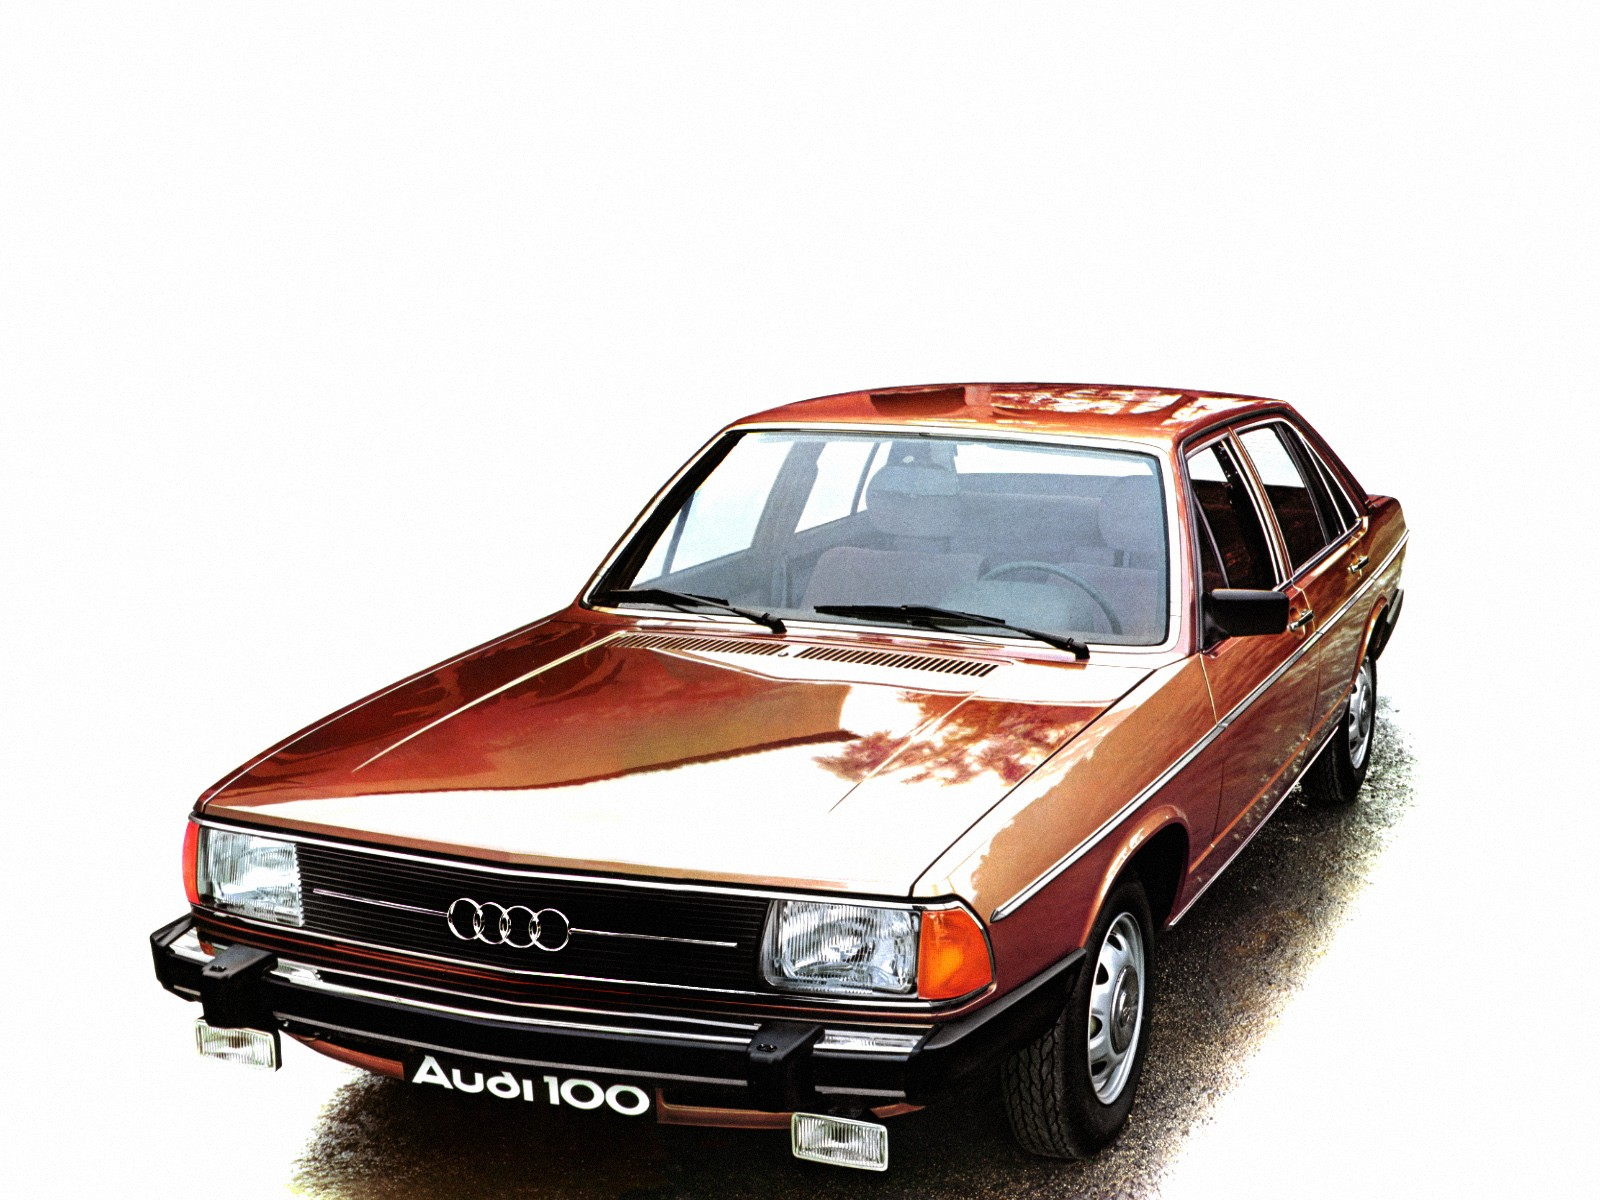 audi 100 c2 specs 1976 1977 1978 1979 1980 1981 1982 autoevolution. Black Bedroom Furniture Sets. Home Design Ideas